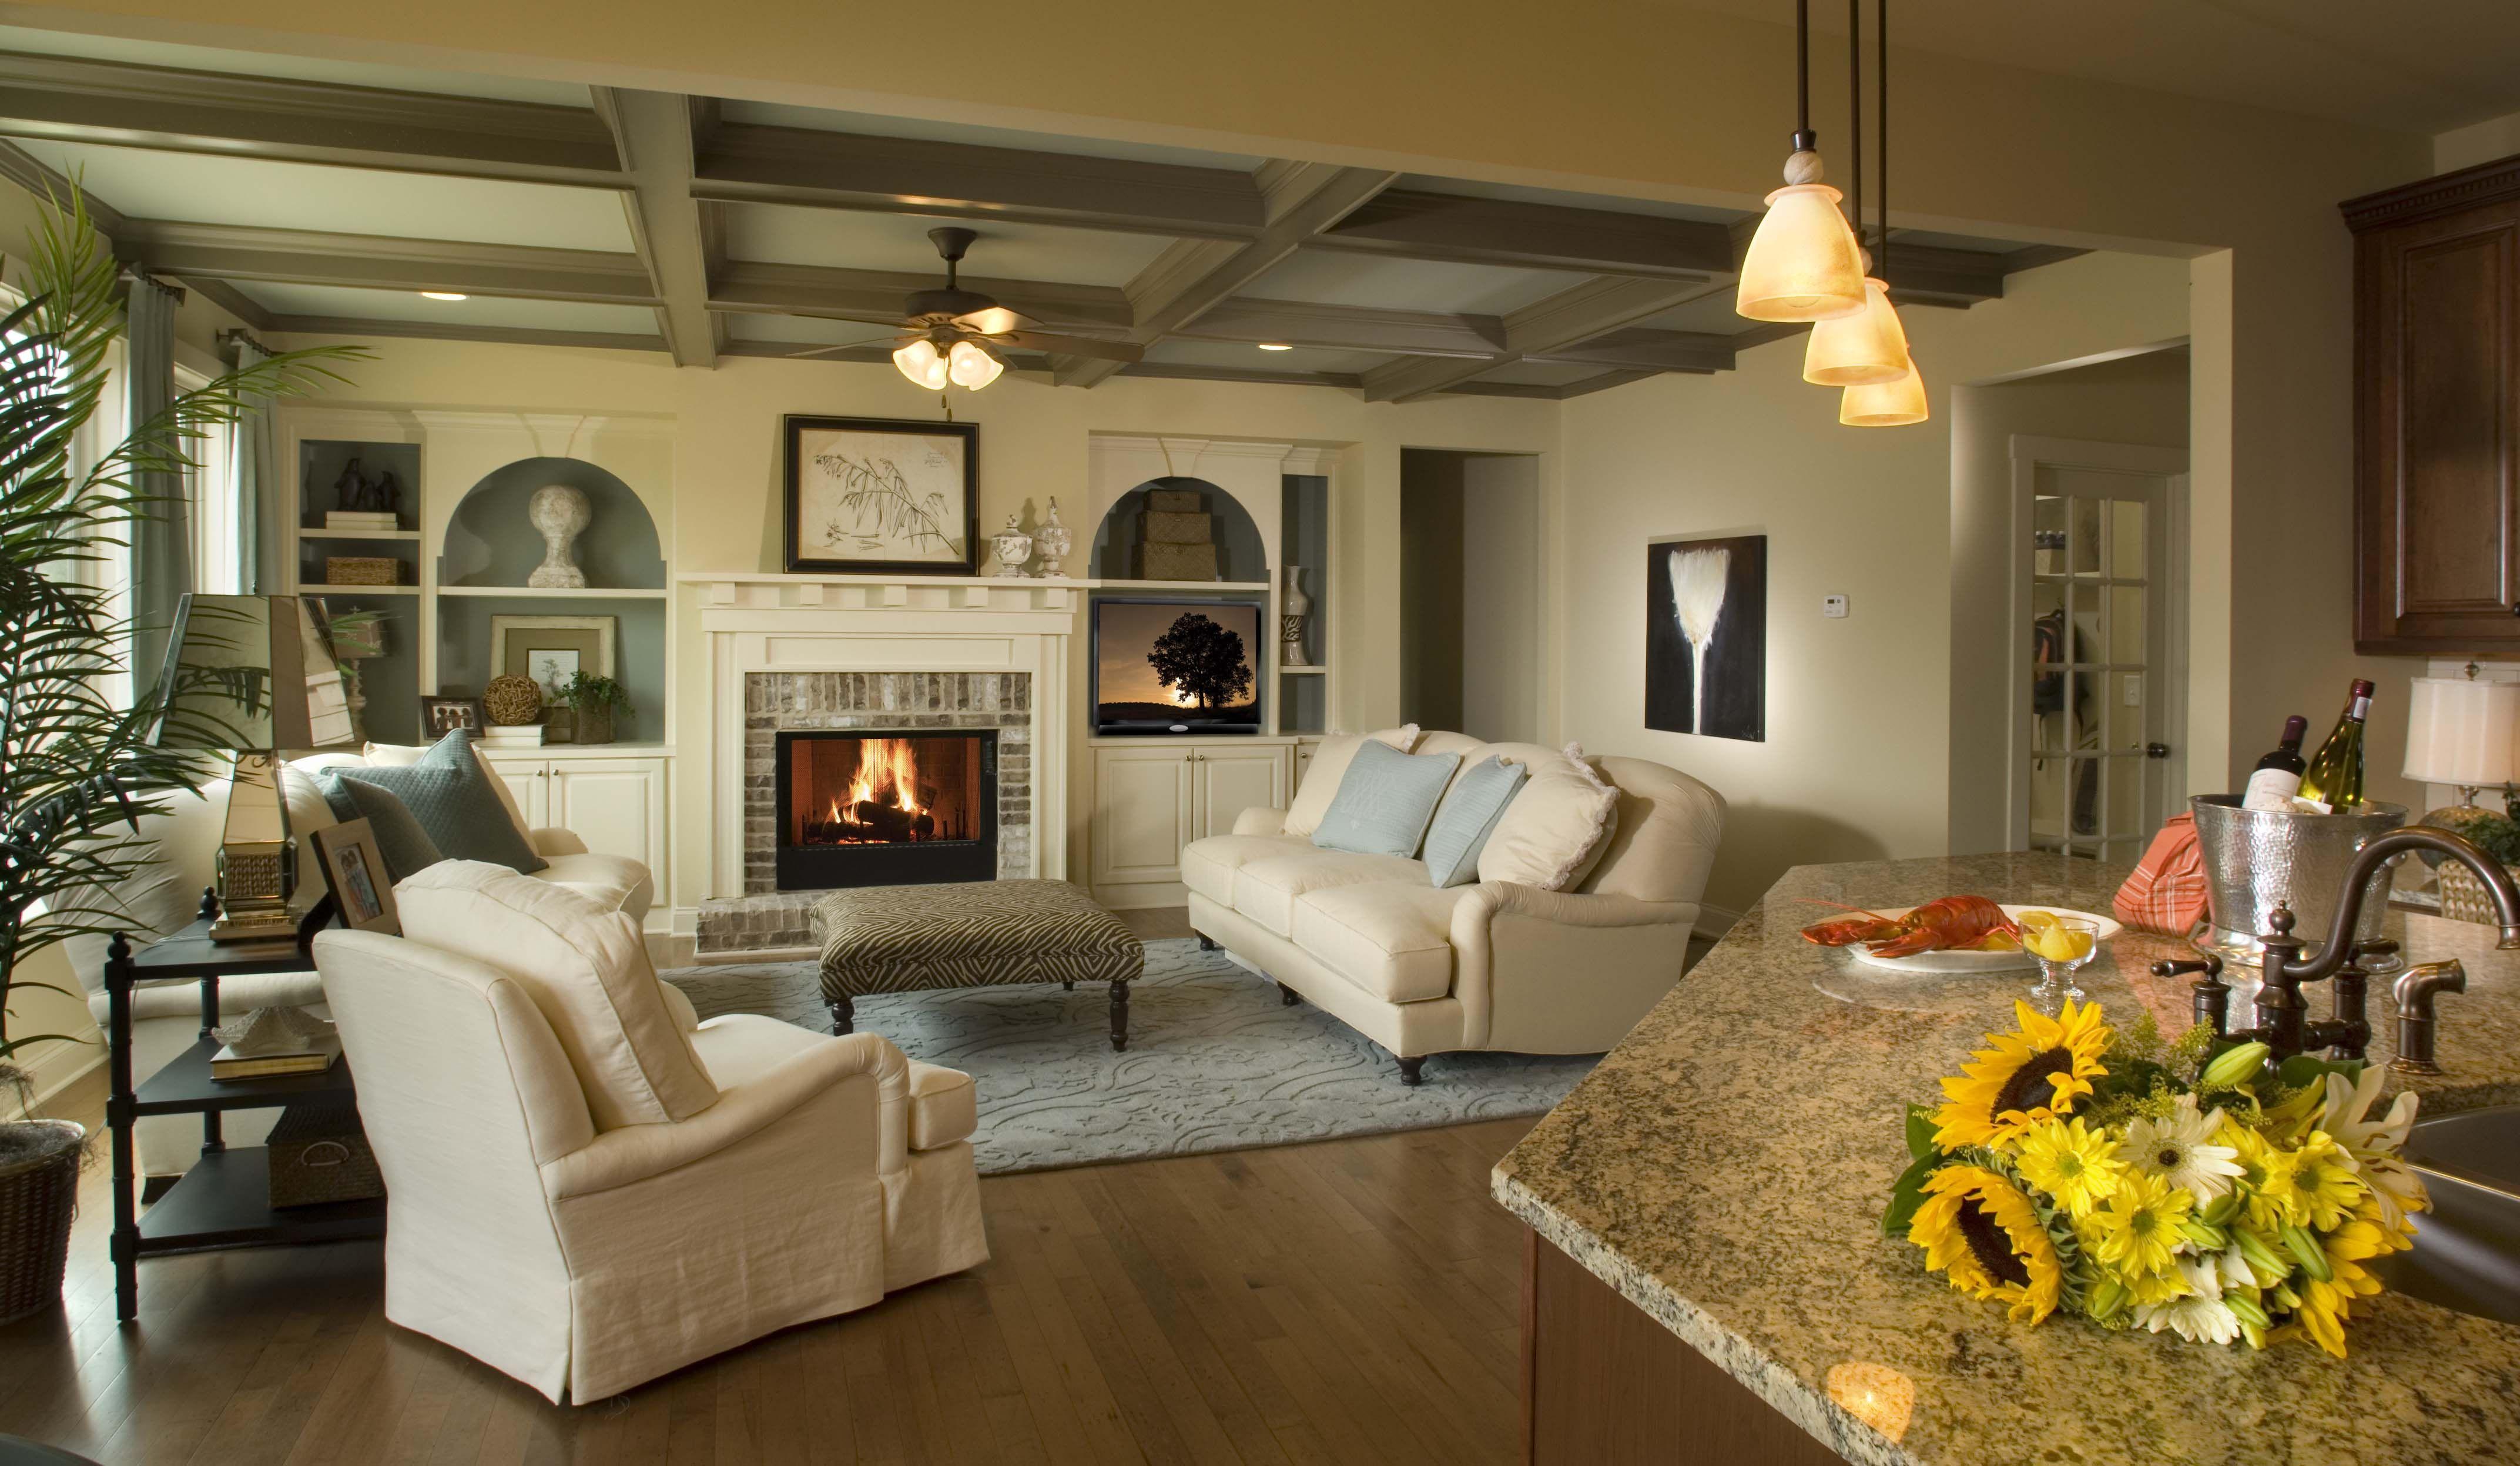 Ghfghfgh  Places To Visit  Pinterest Impressive Simple Elegant Living Room Design Decorating Design